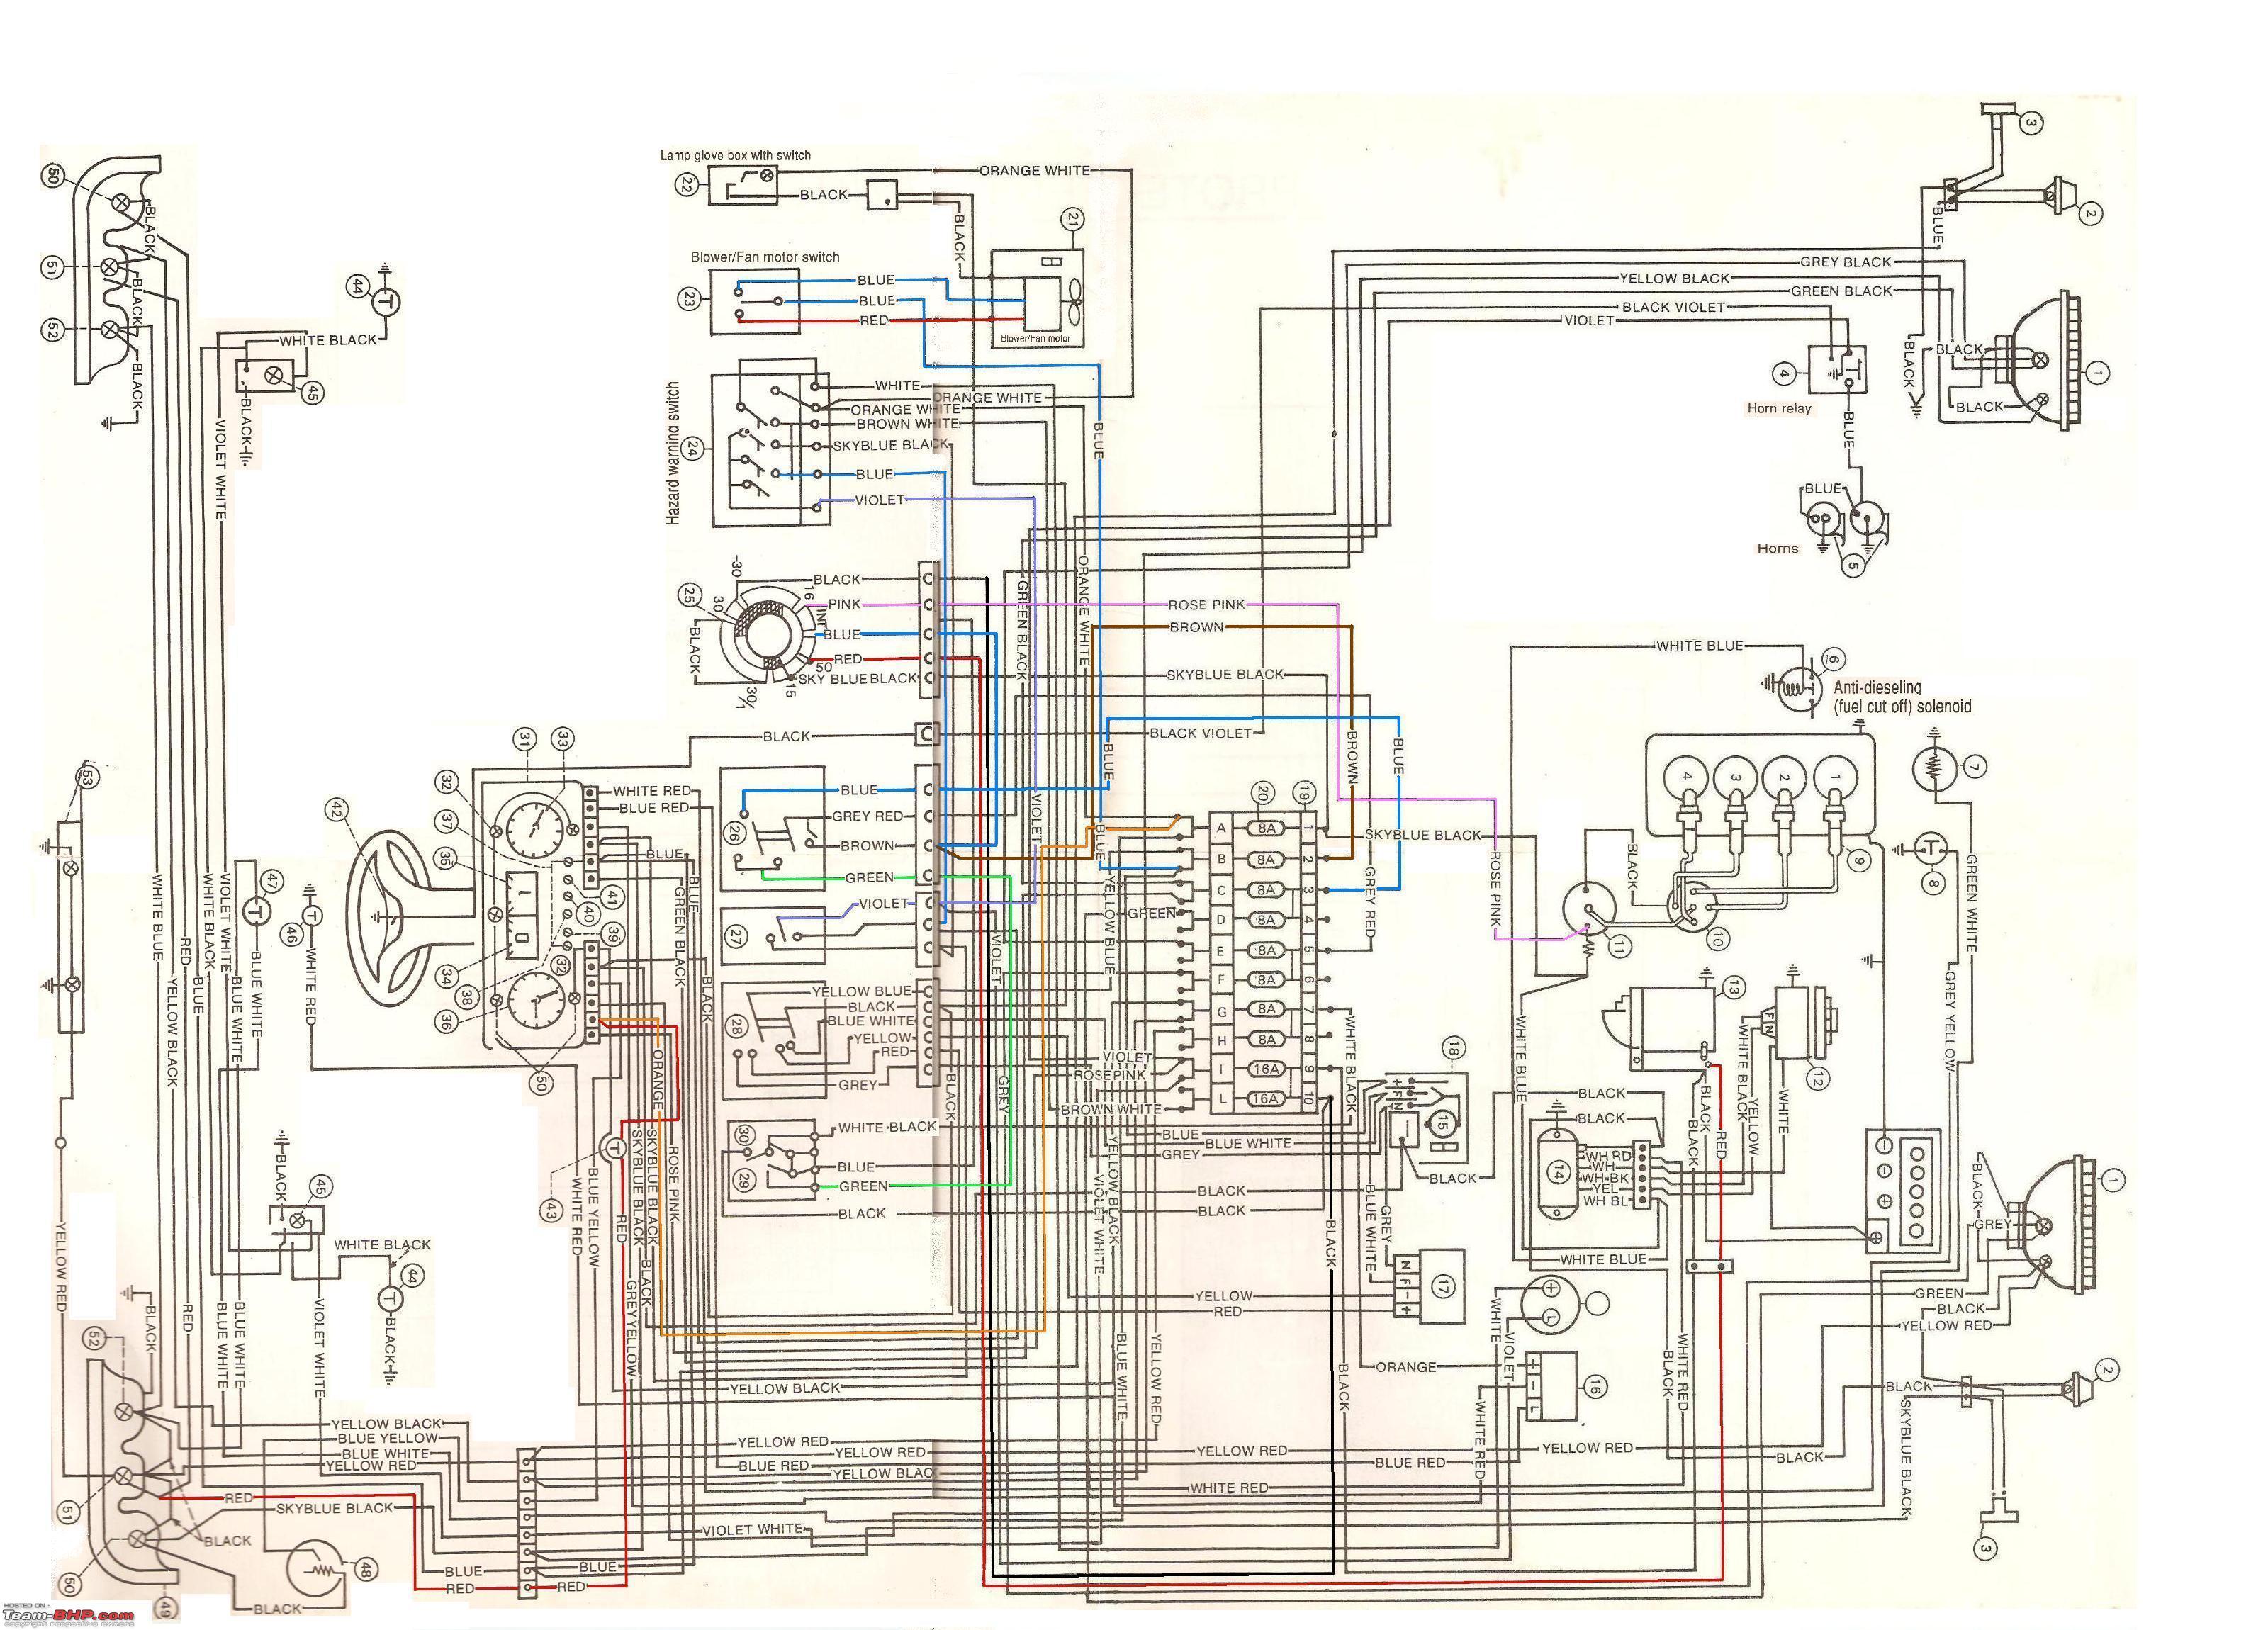 Suzuki Wagon R Engine Diagram - Largest Wiring Diagrams •